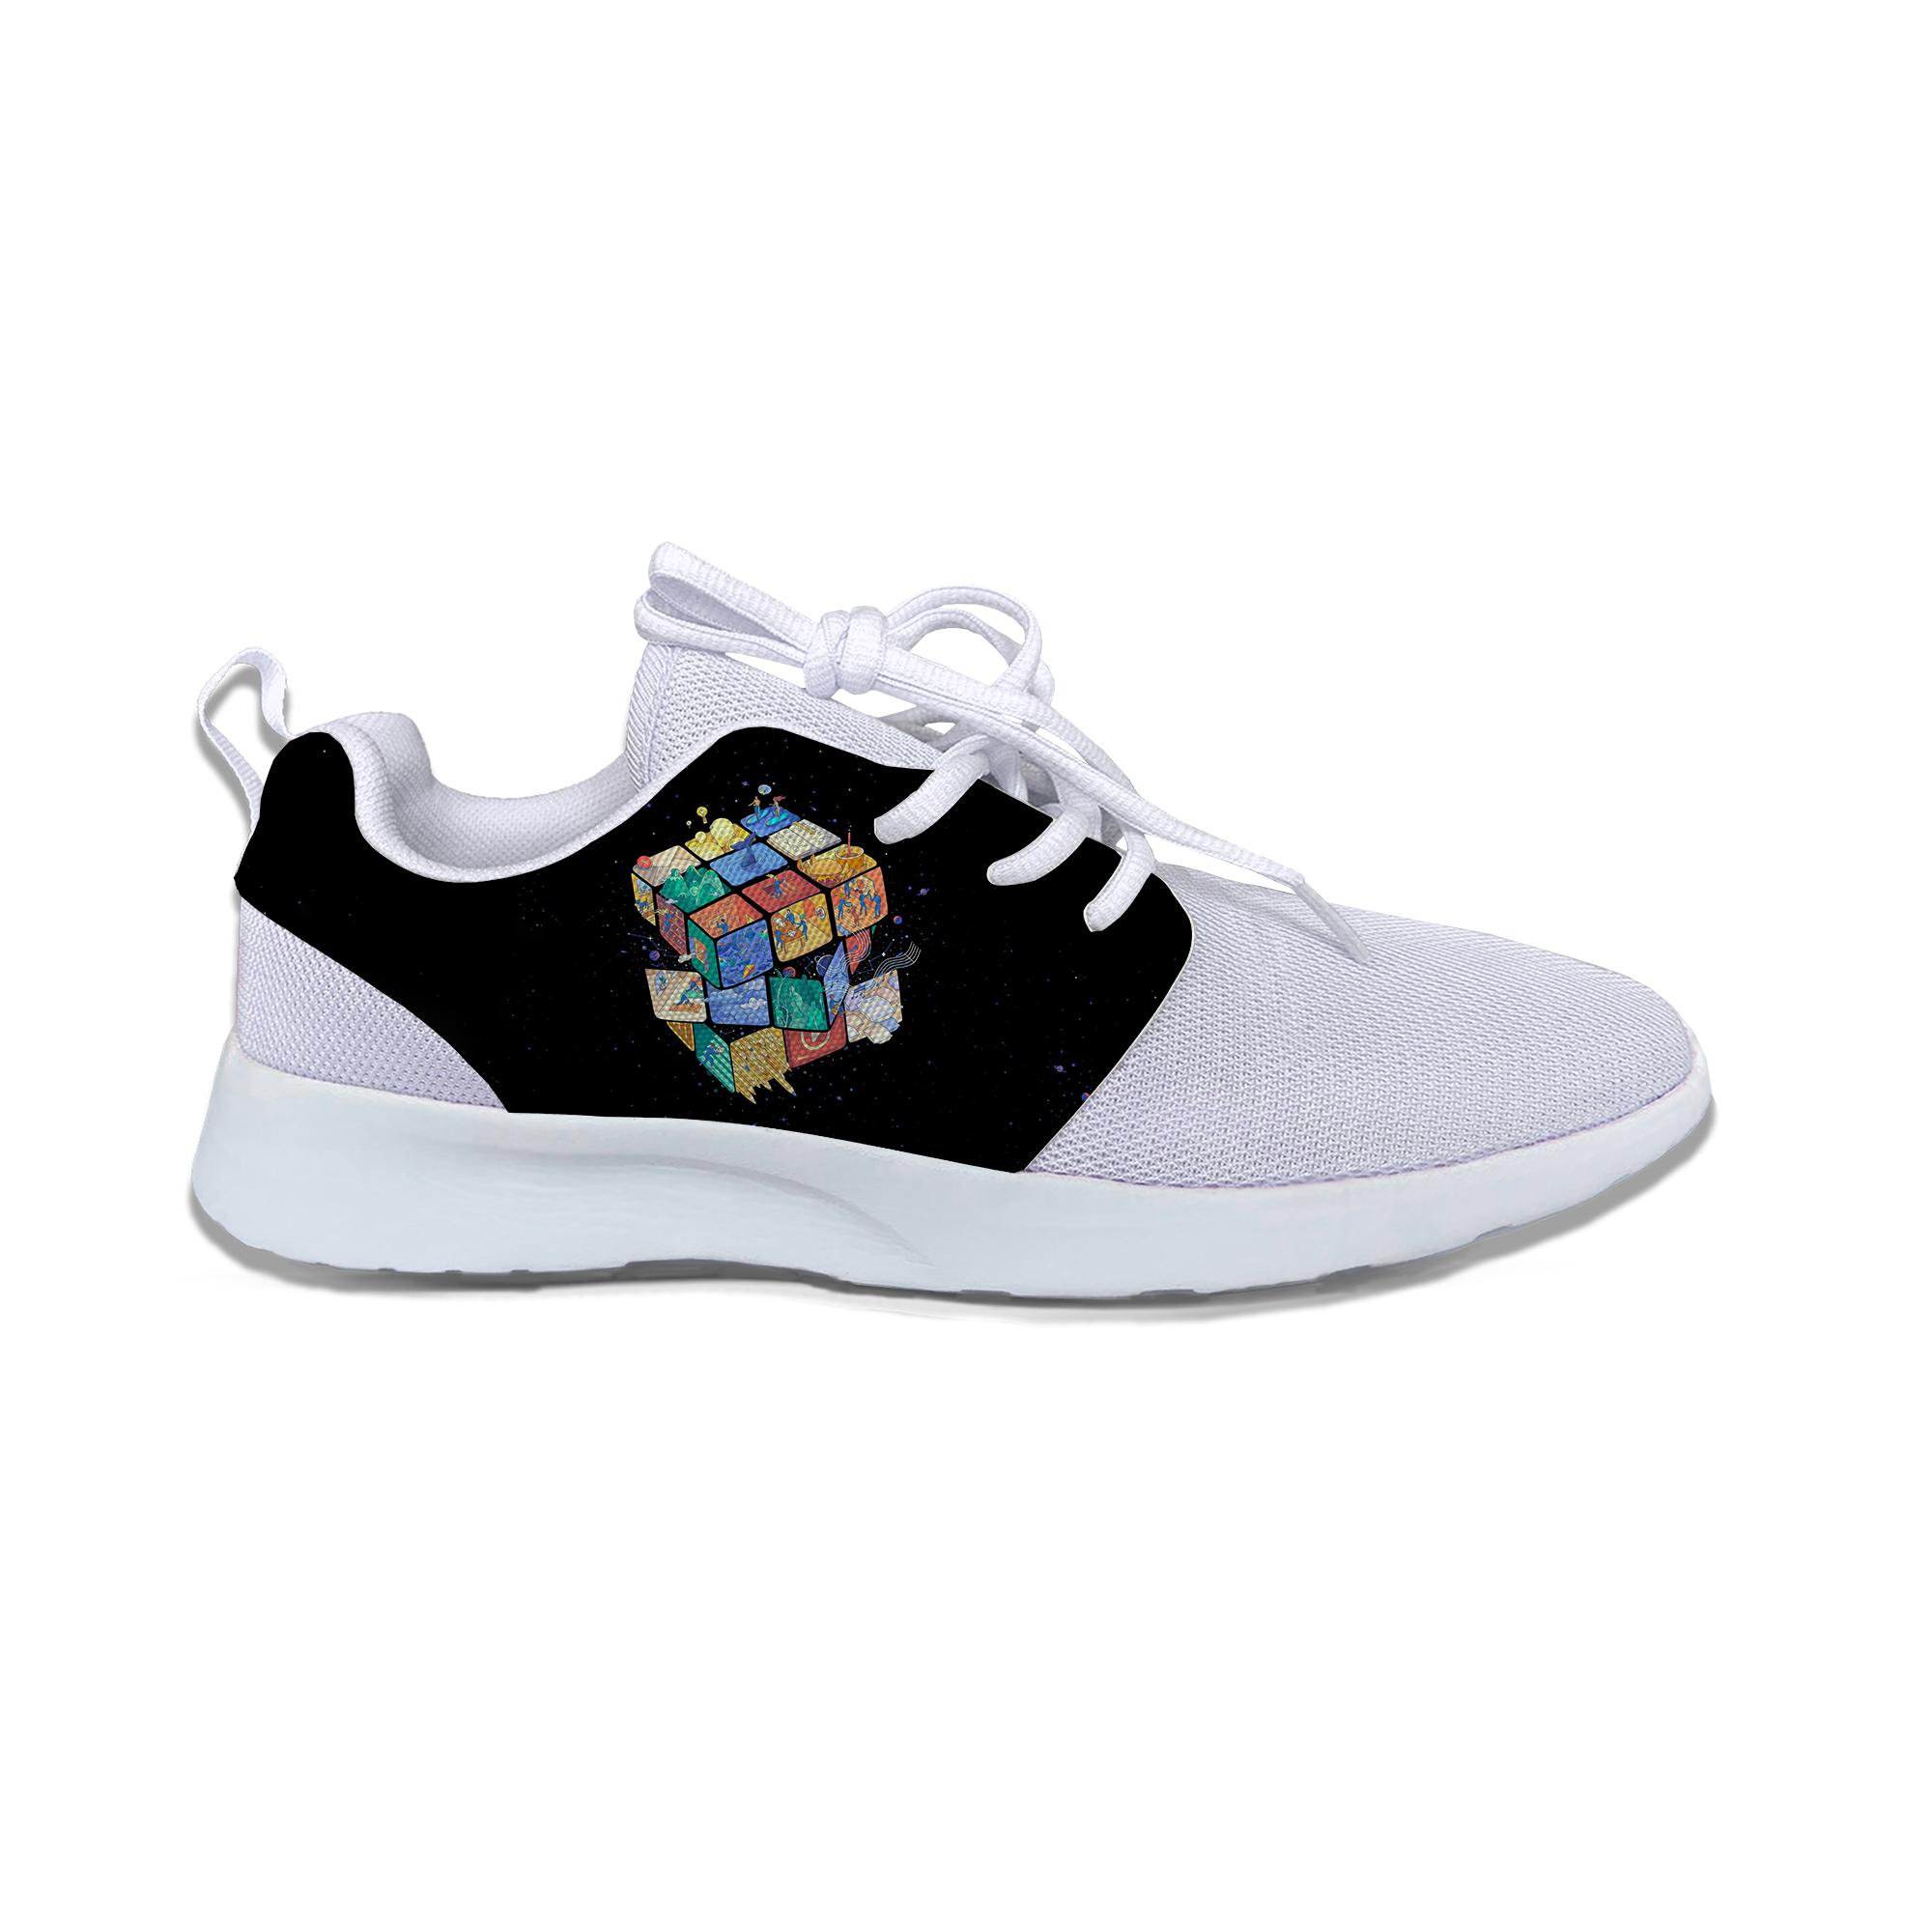 Rubik's Cube Hot Cool Cartoon Sport Running Shoes Funny Kids Breathable Lightweight Mesh Sneakers Gift For boys girls Children